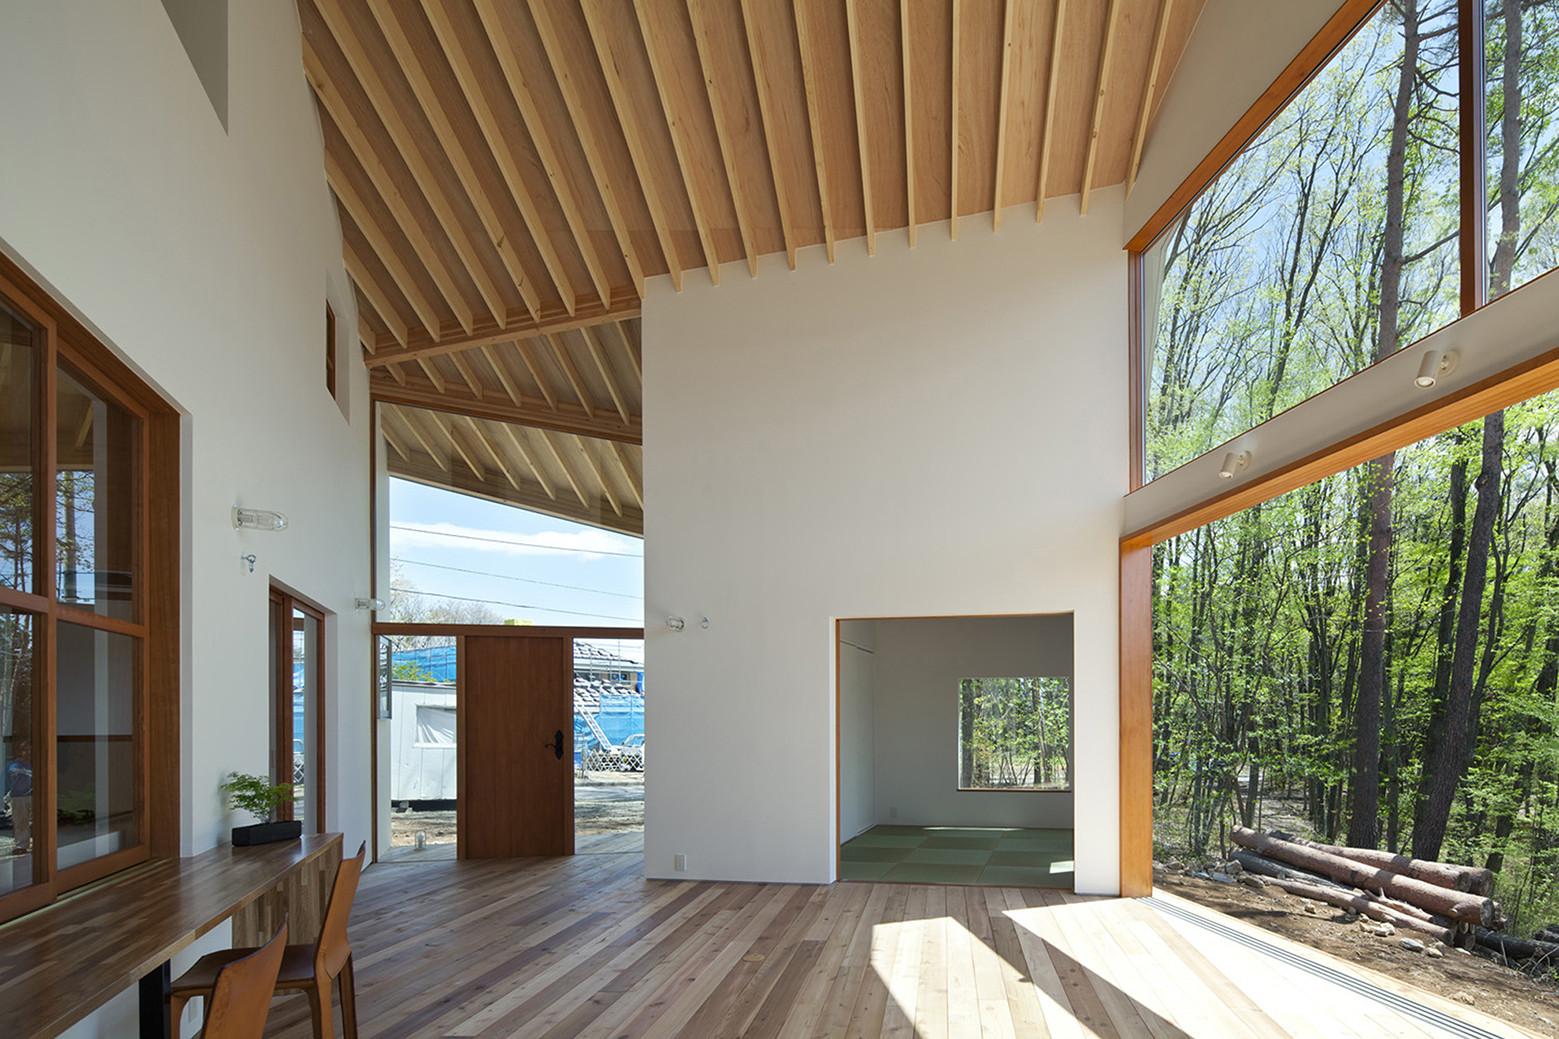 House for Viewing the Mountain / Kawashima Mayumi Architects Design, © Toshiyuki Yano